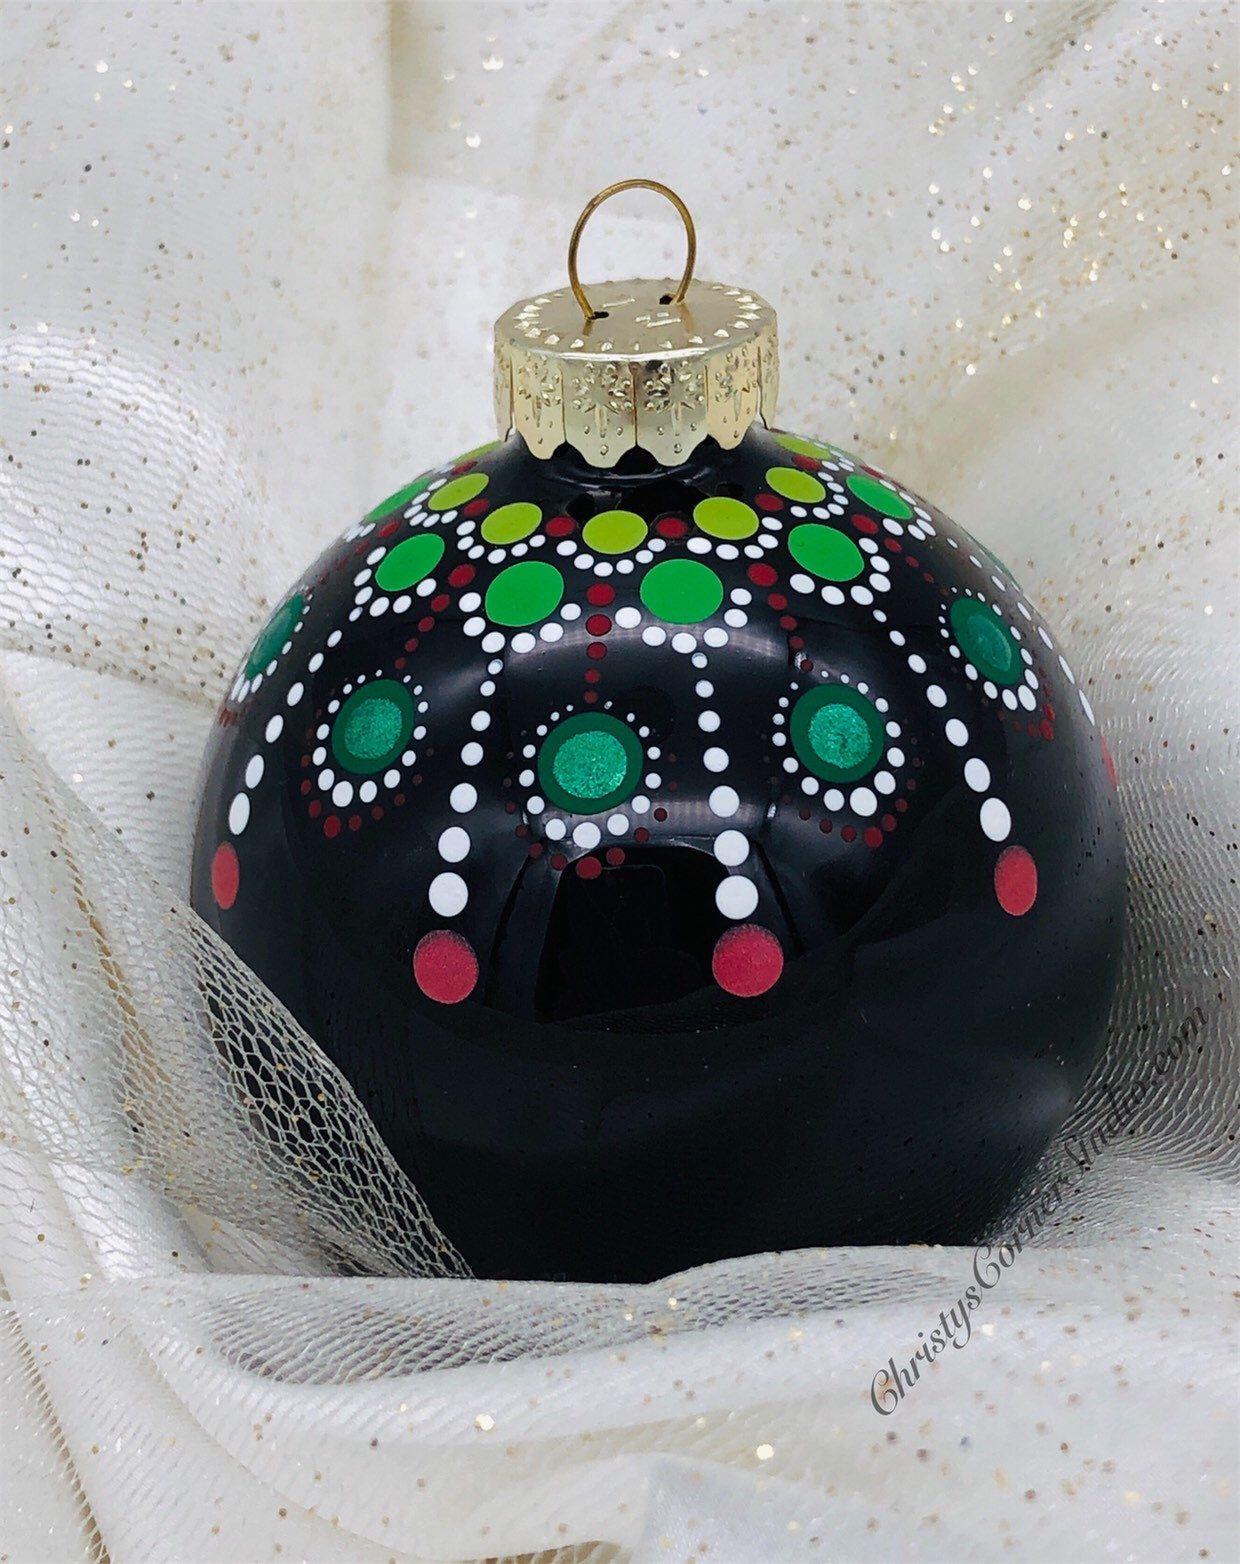 Hand Painted Mandala Christmas Ornament Black Glass Ball Etsy Handpainted Christmas Ornaments Christmas Ornaments Christmas Ornament Crafts